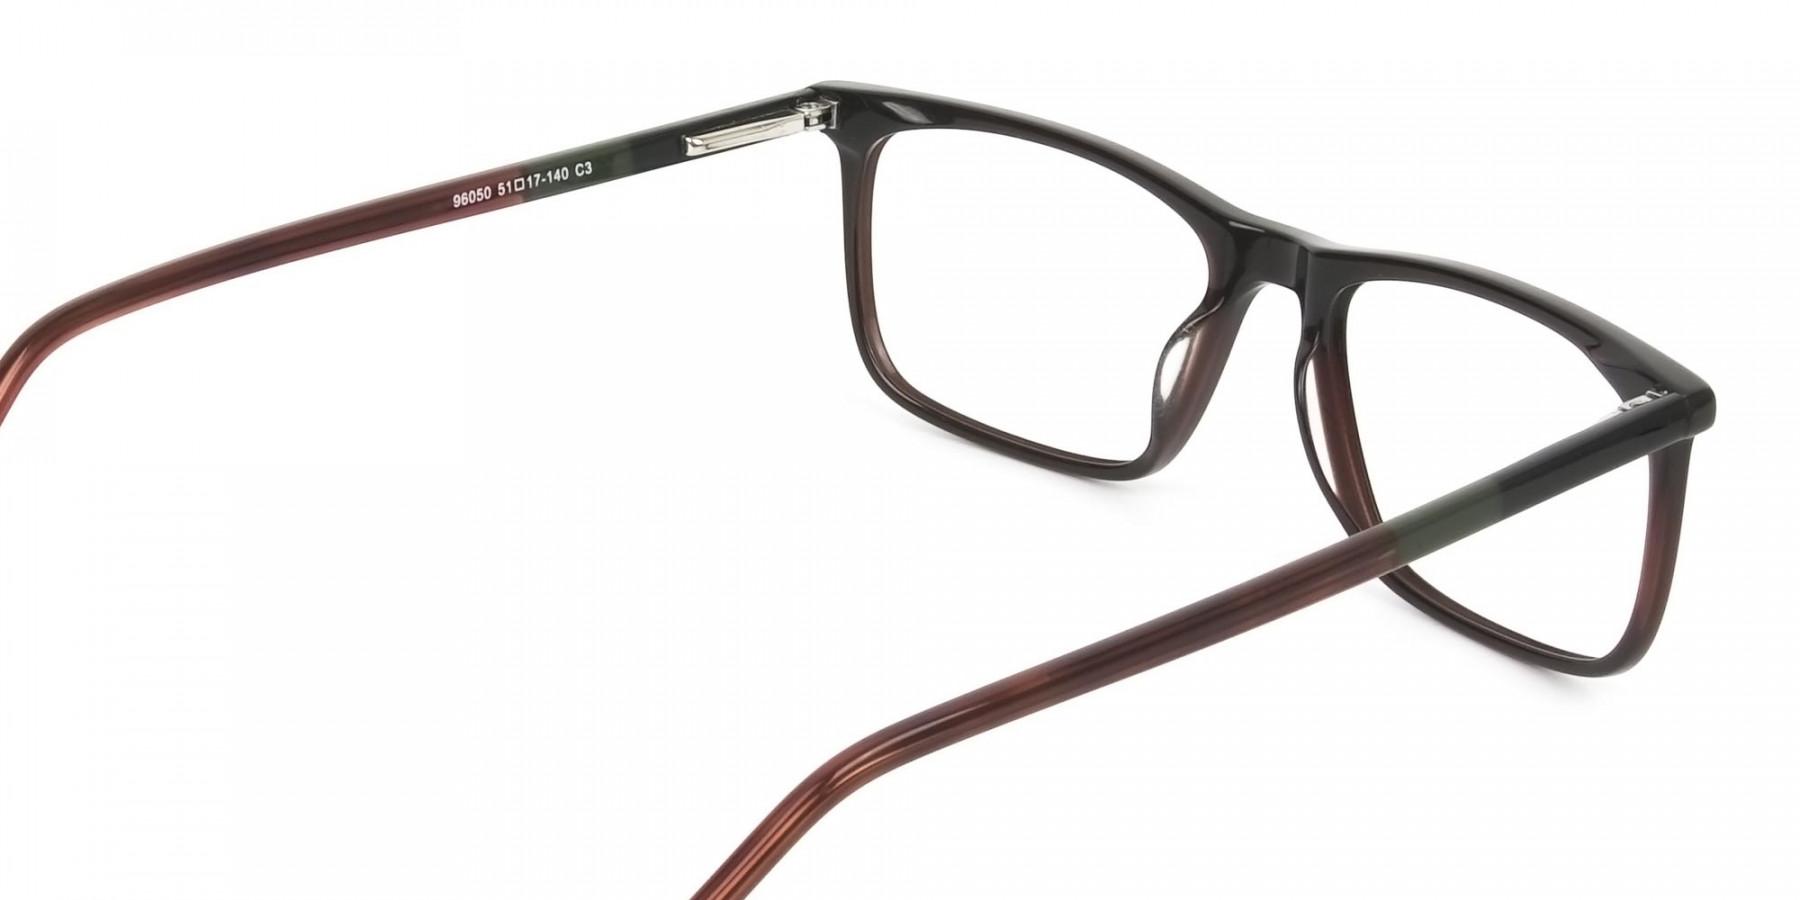 Dark Brown Acetate Spectacles in Rectangular - 1